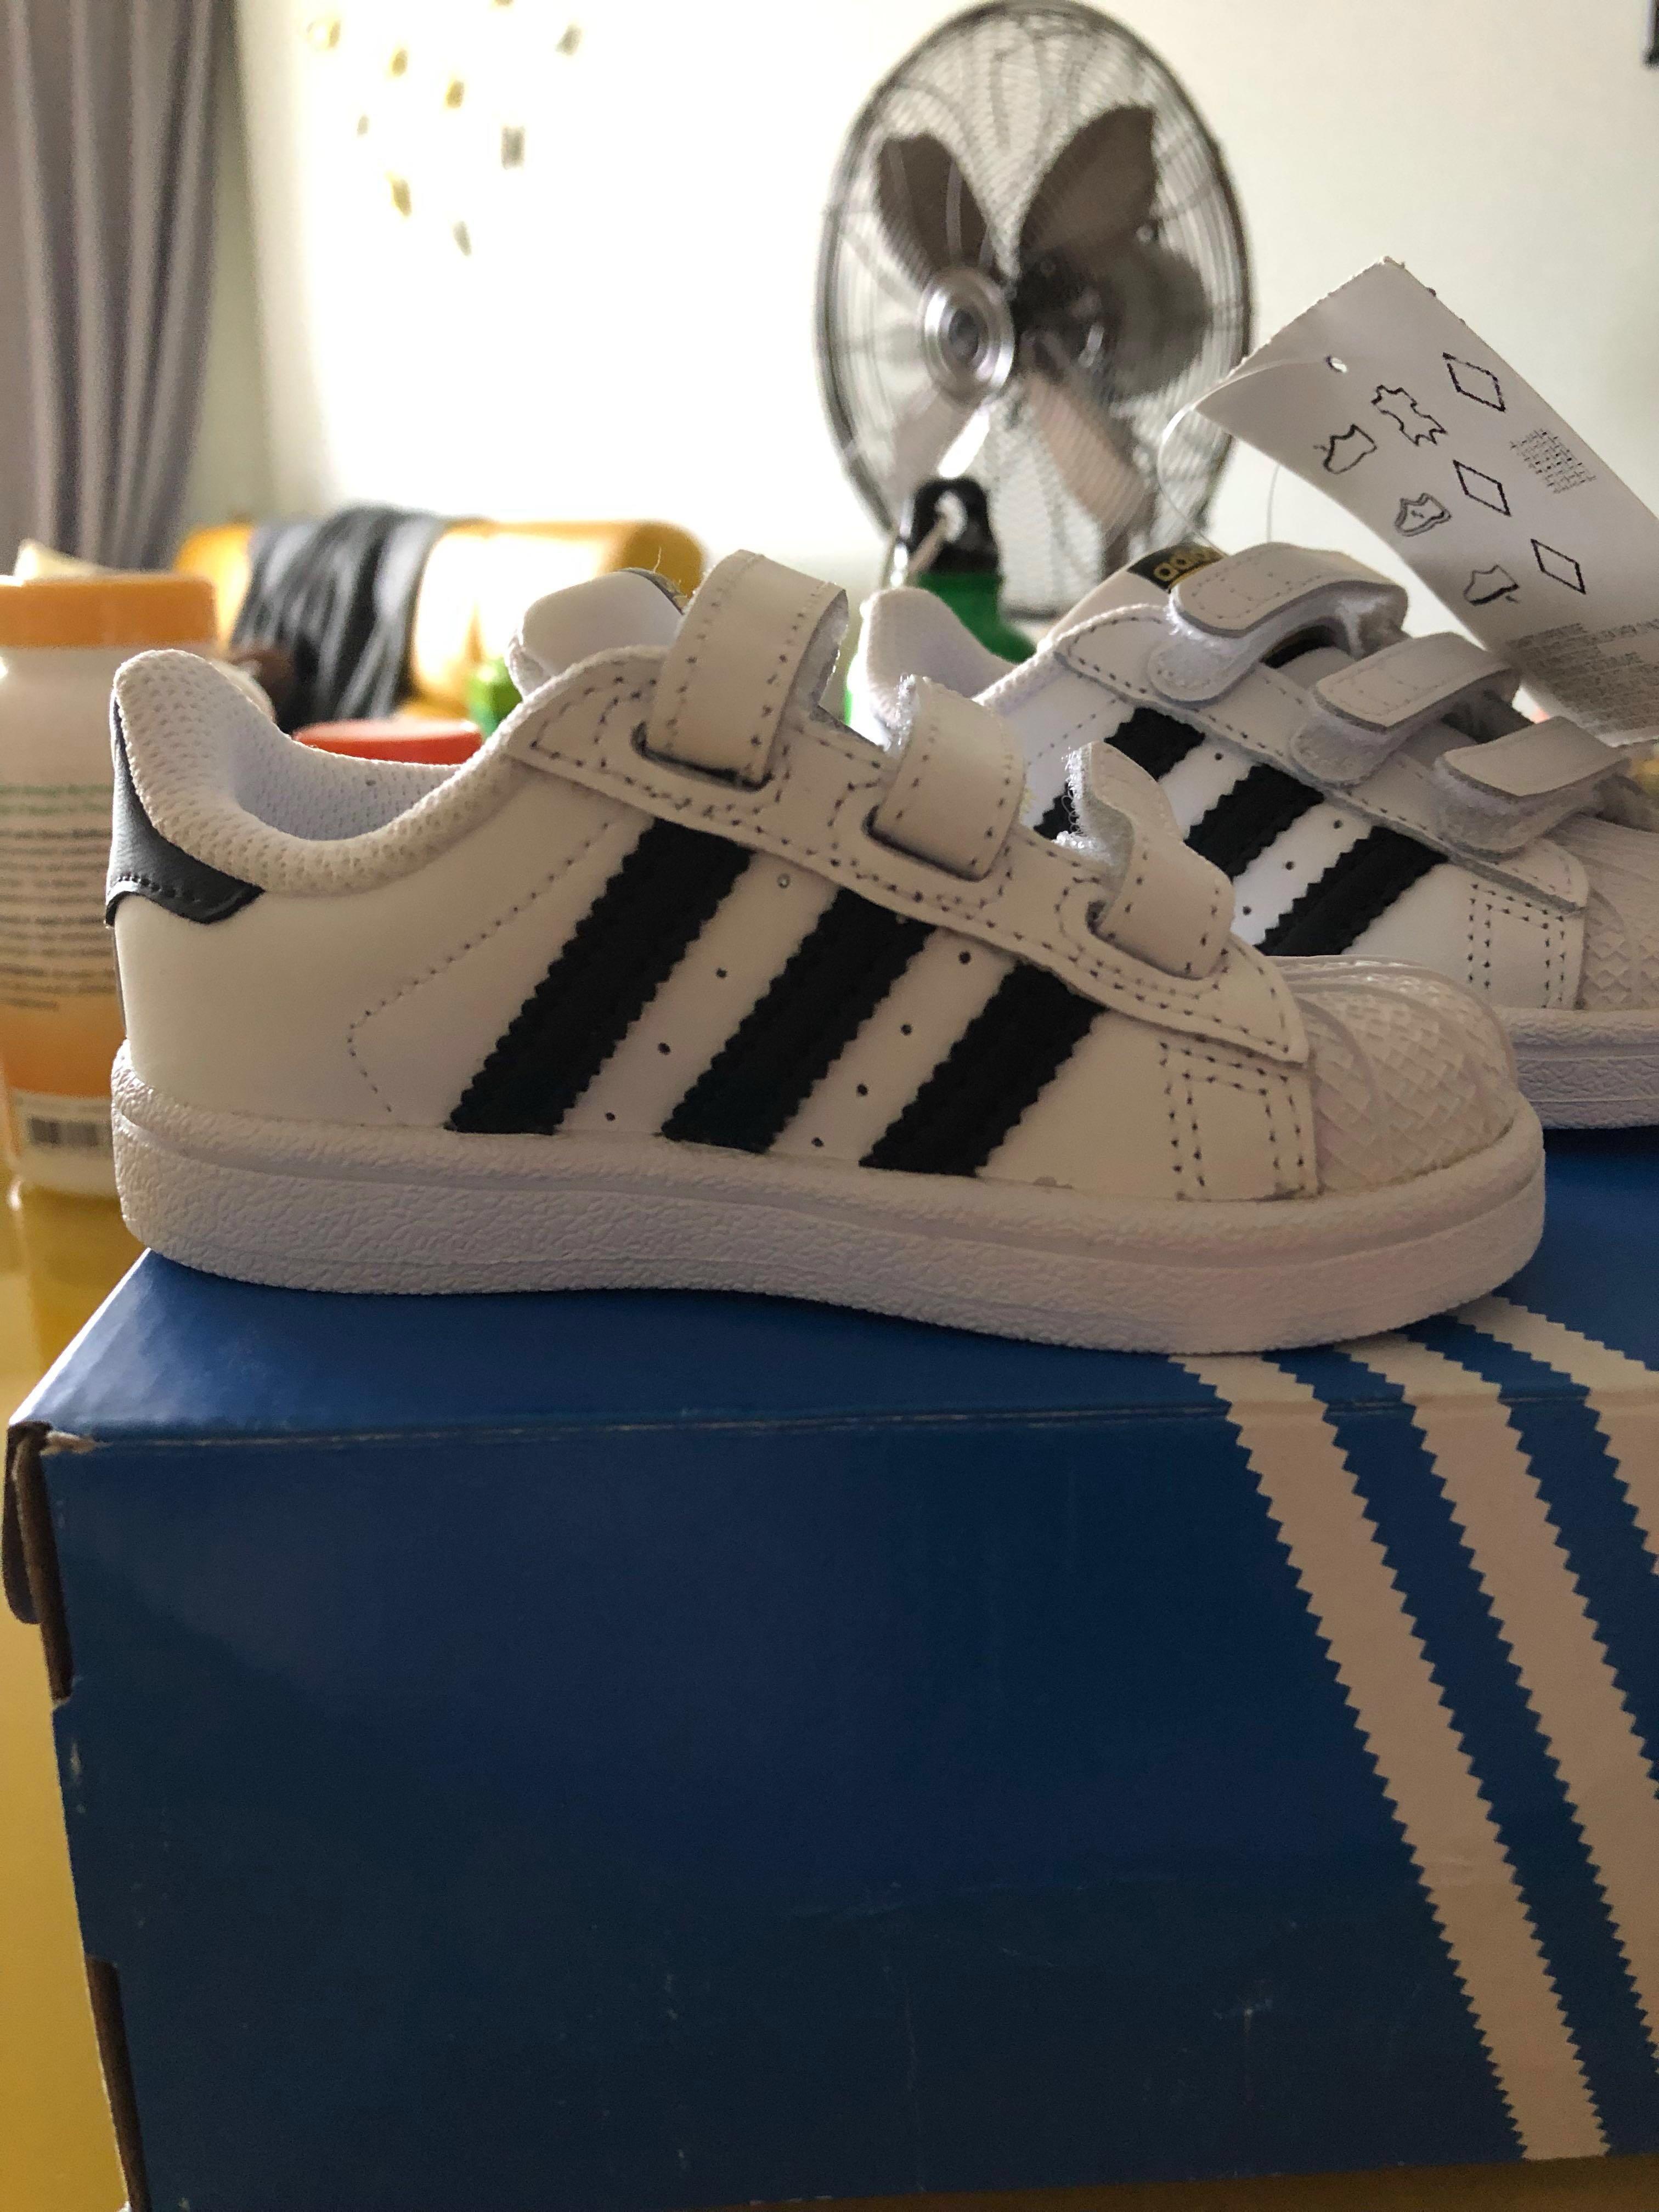 premium selection c6179 d3a0b Adidas Superstar Shoes, Babies & Kids, Boys' Apparel, 1 to 3 ...